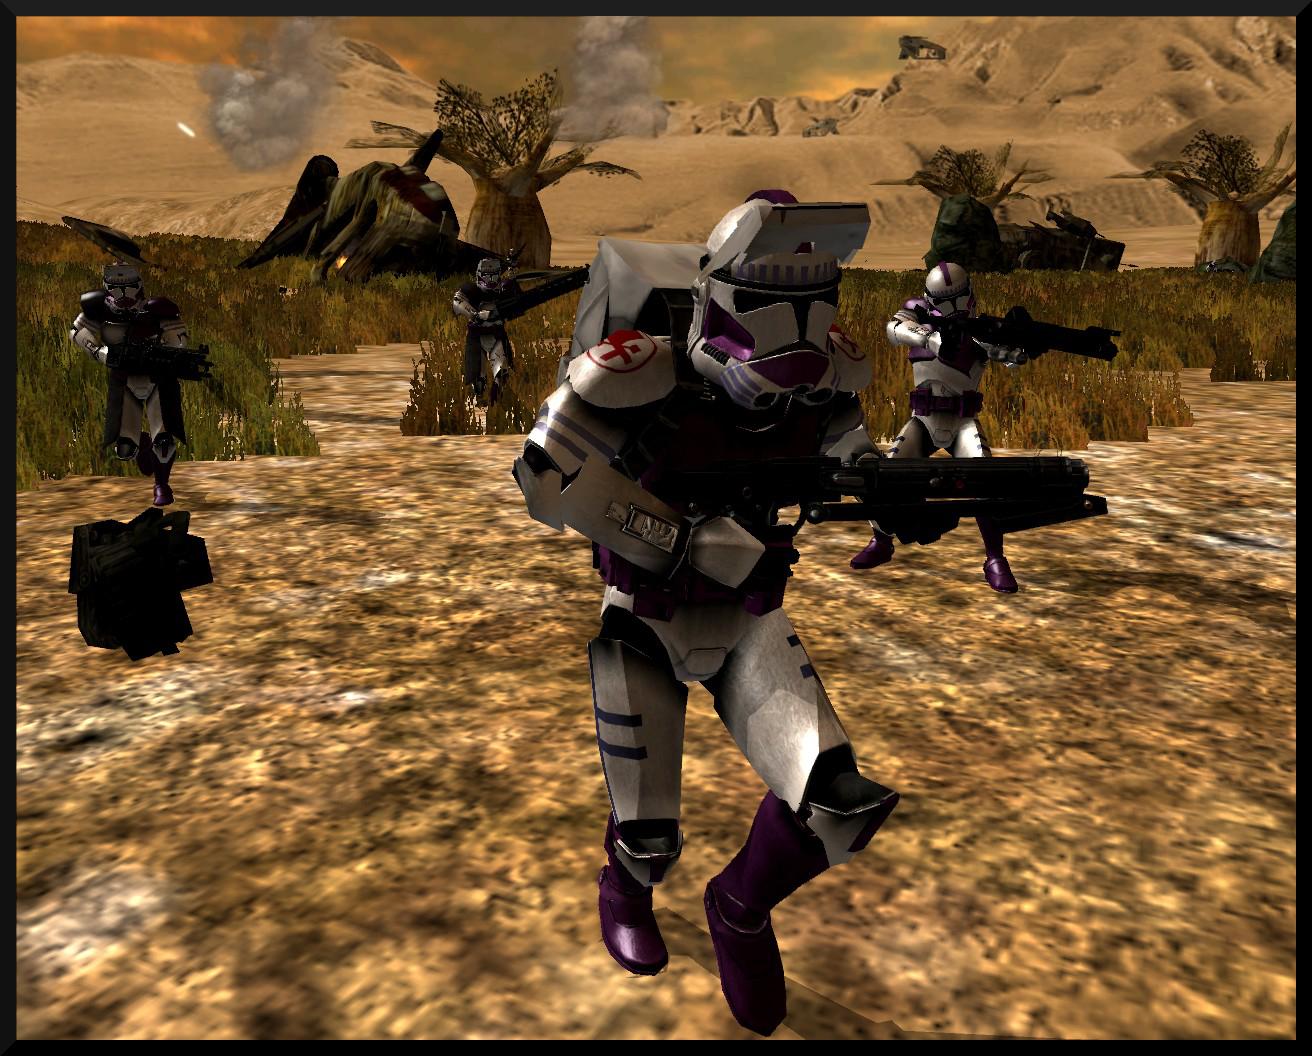 187th Medic Dantooine